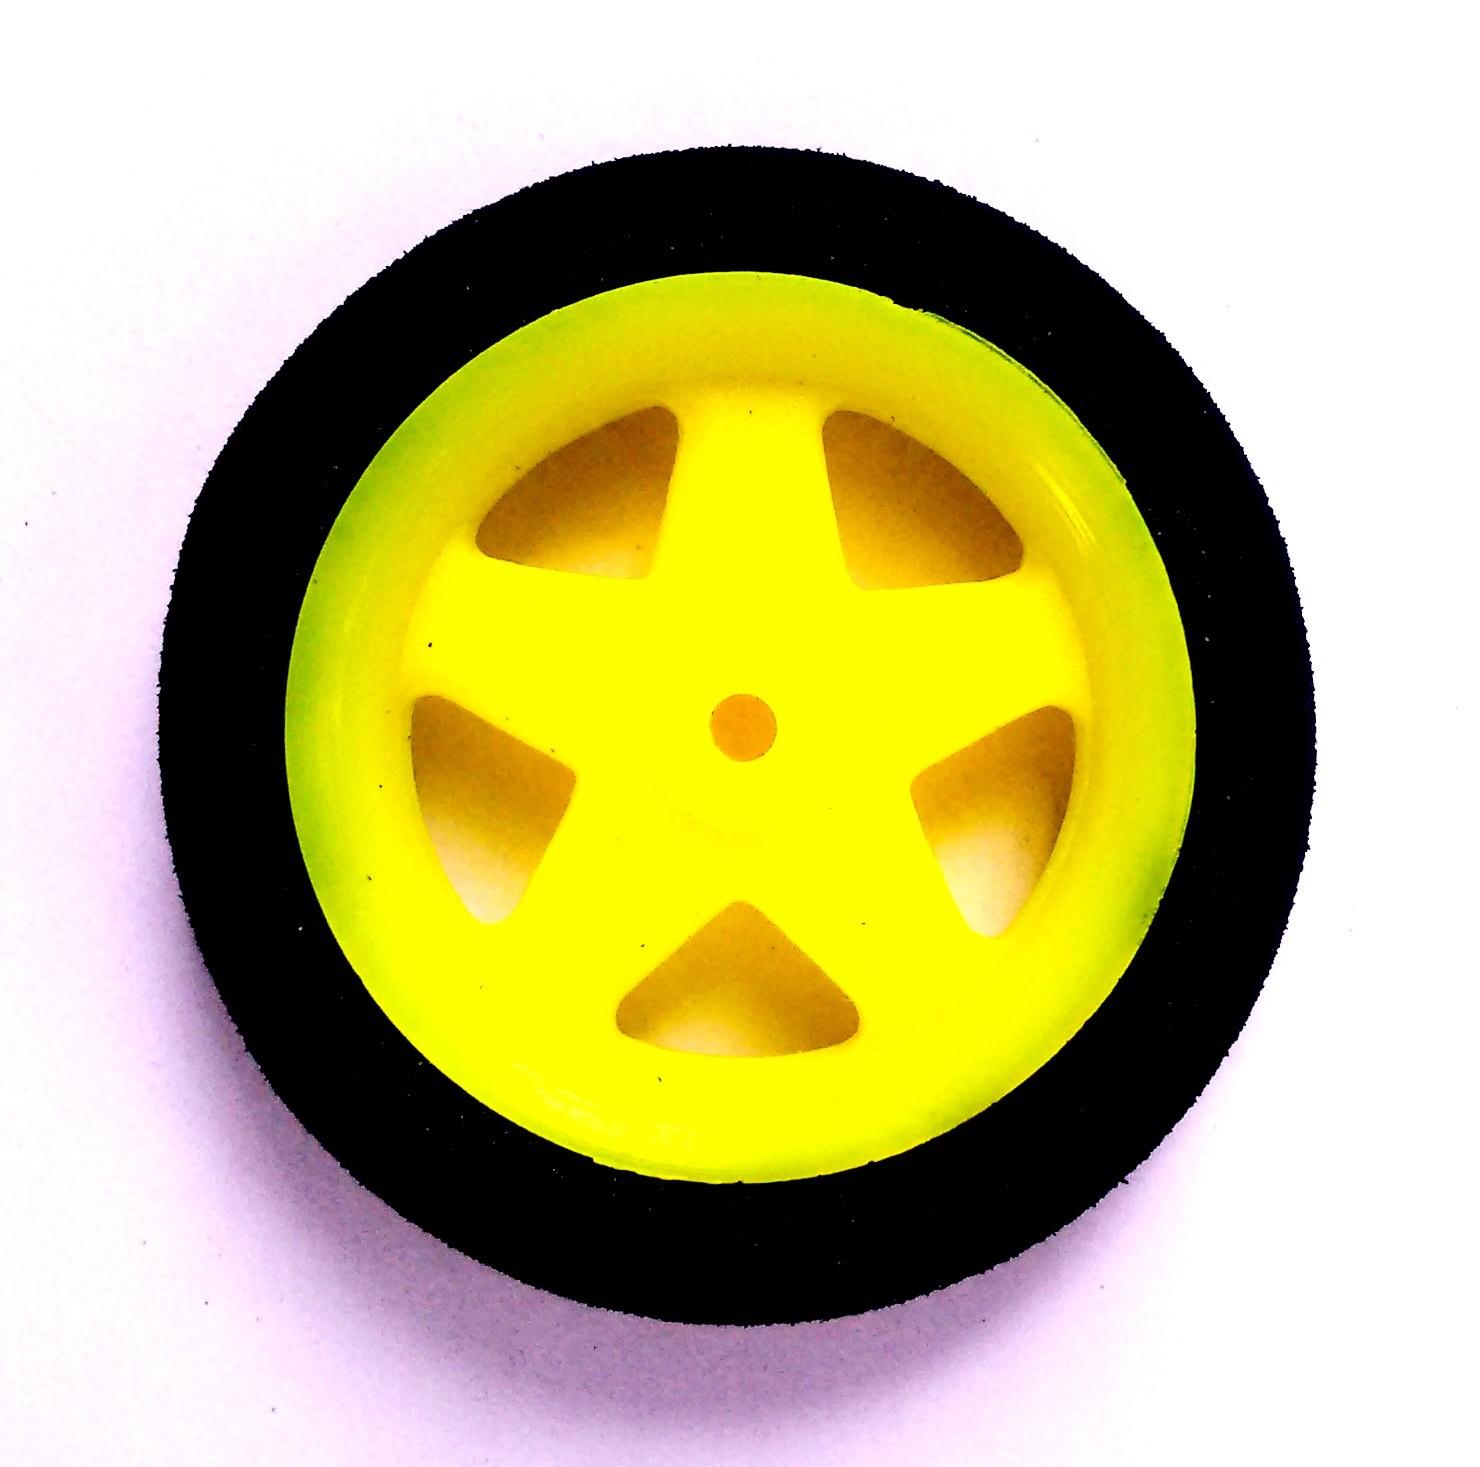 10399 - Roda Super Light 5 Spoke (Diâmetro: 36mm, Largura: 8mm)